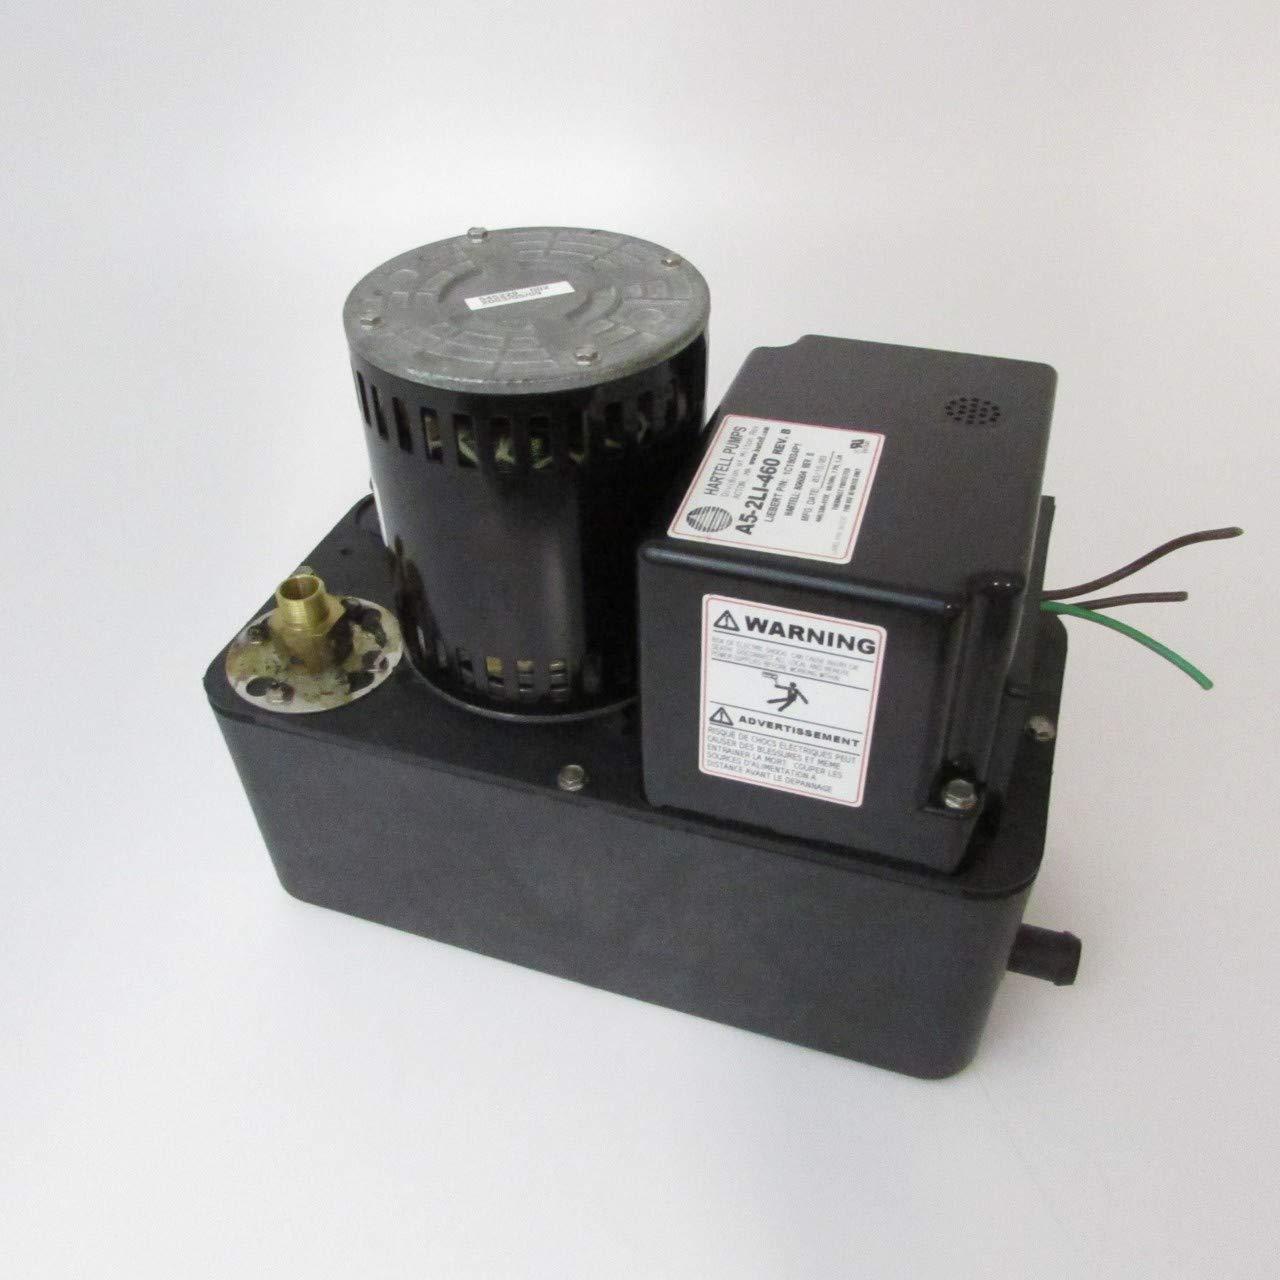 hartell condensate pump wiring diagram hartell a52li460 condensate pump 1 pkg 460 380 415v 1 2a 60 50hz  condensate pump 1 pkg 460 380 415v 1 2